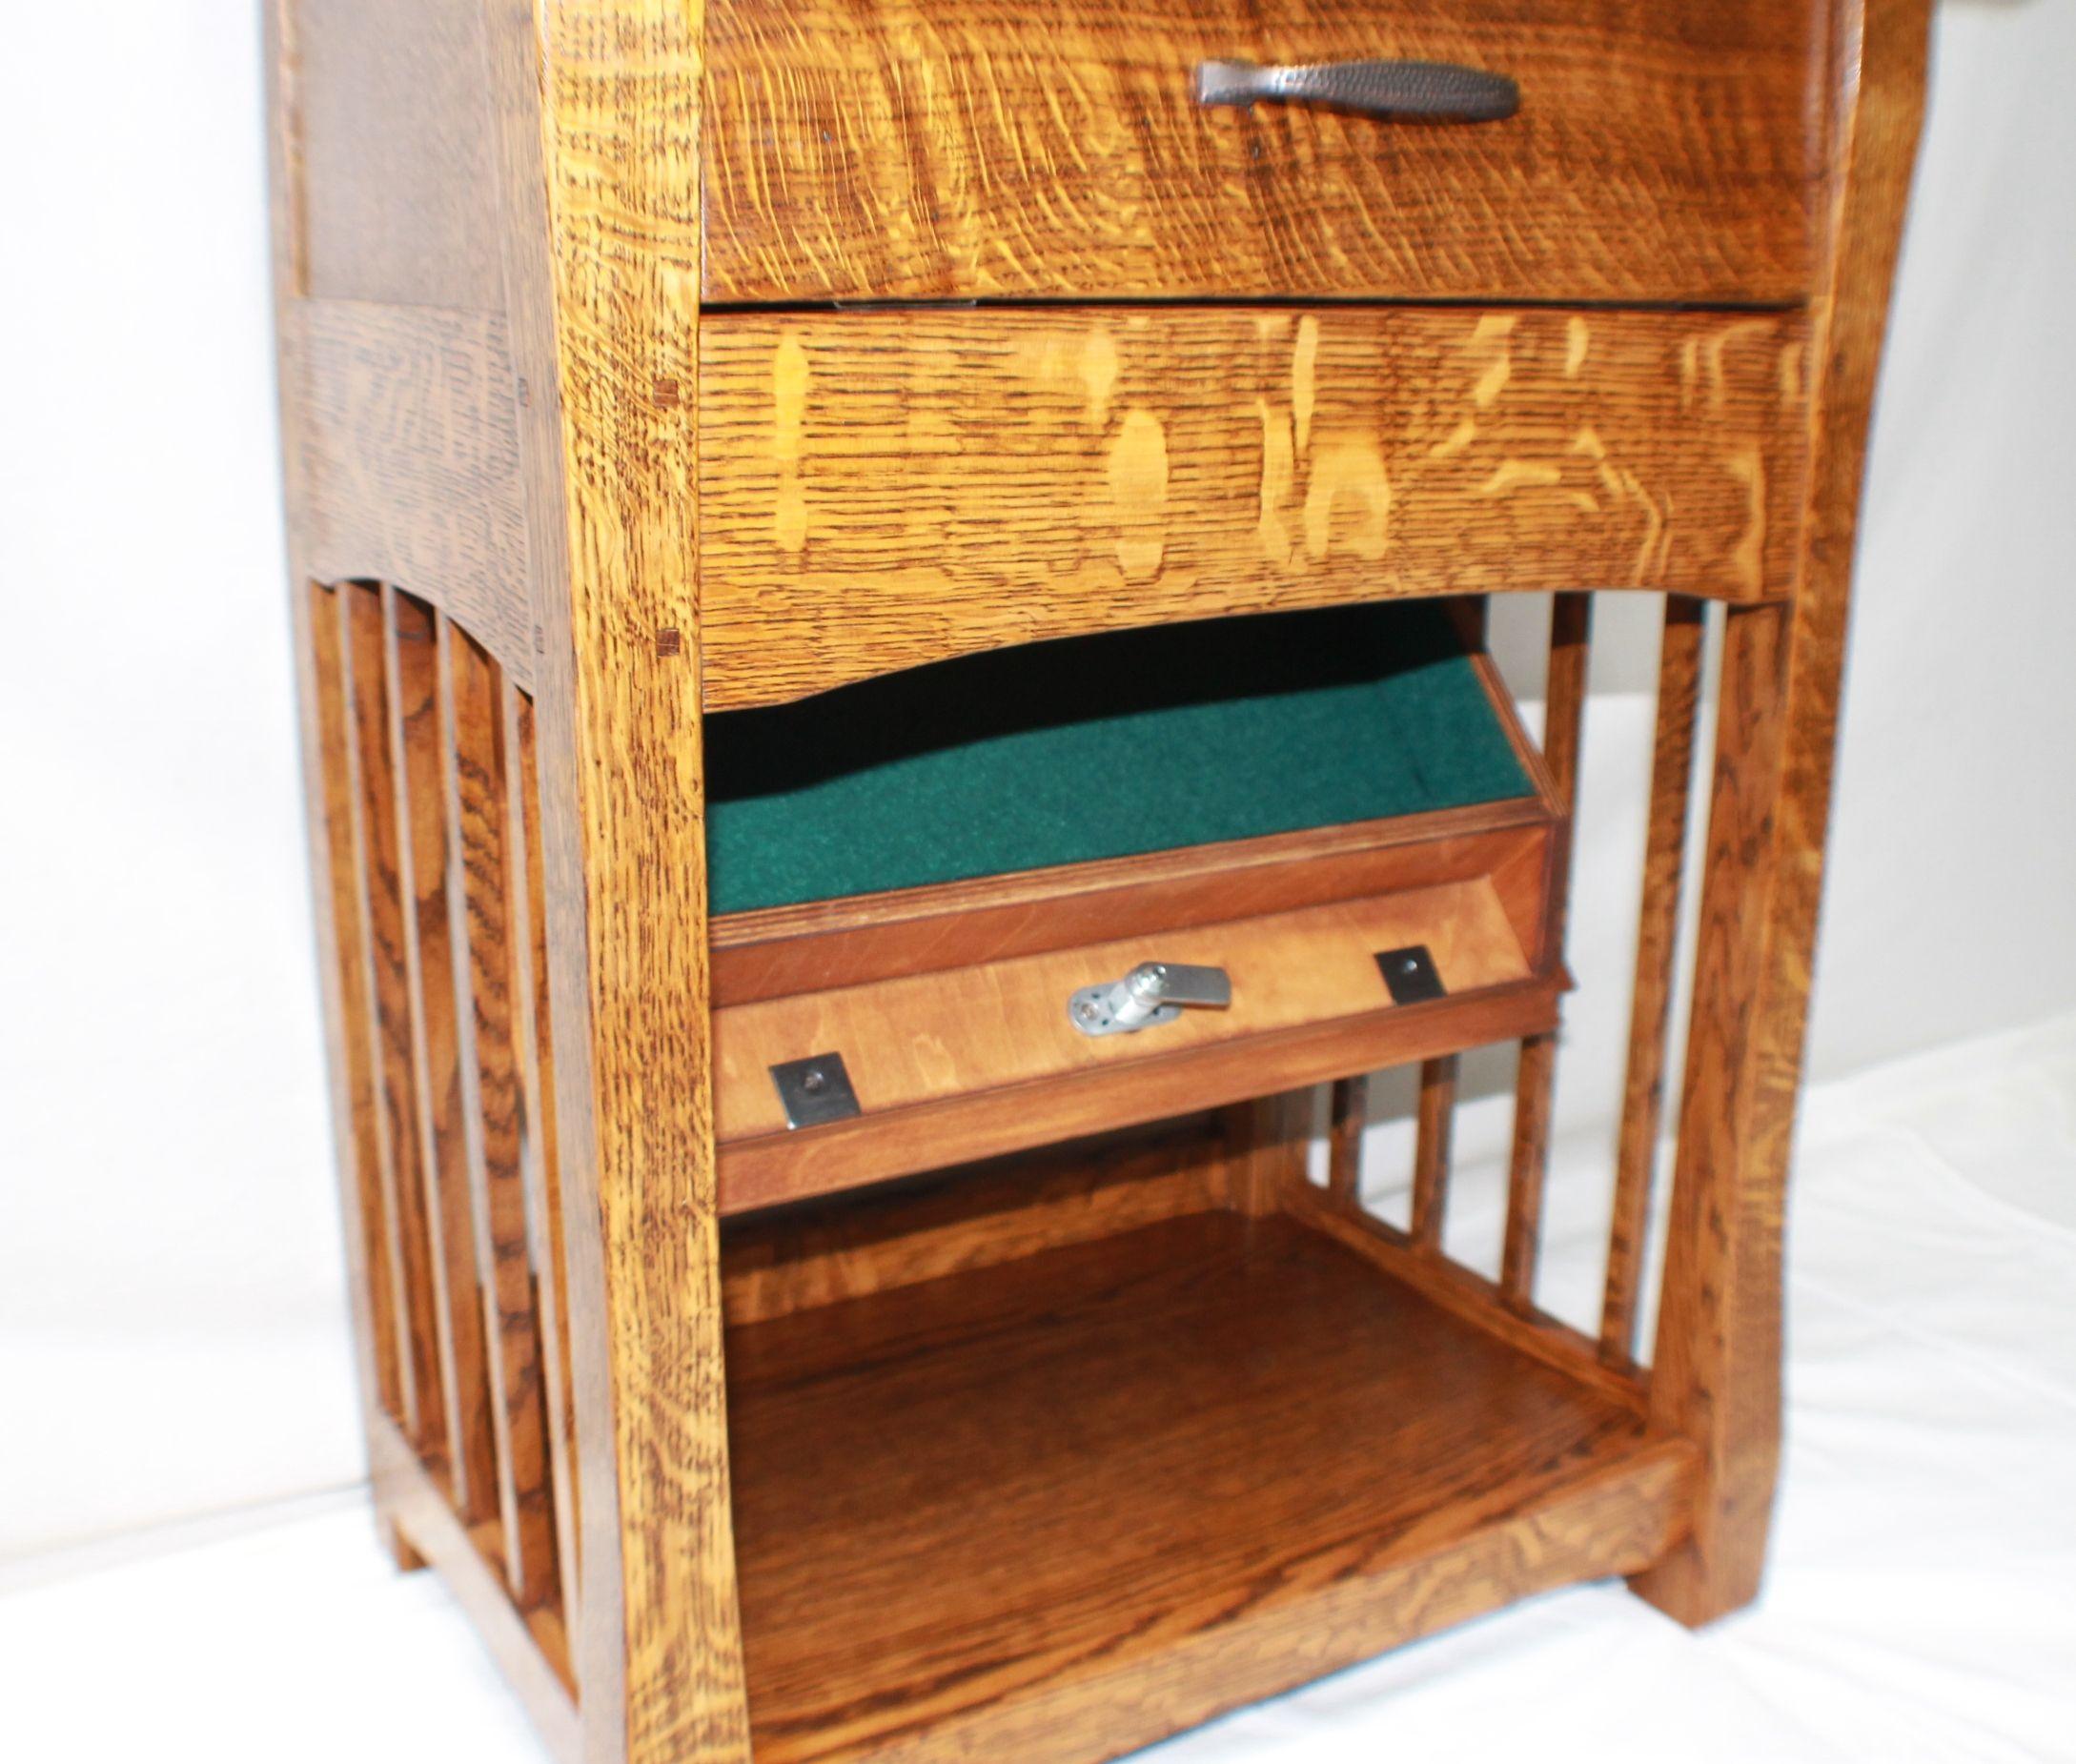 Bedside nightstand hidden lockable secrete partment sized for